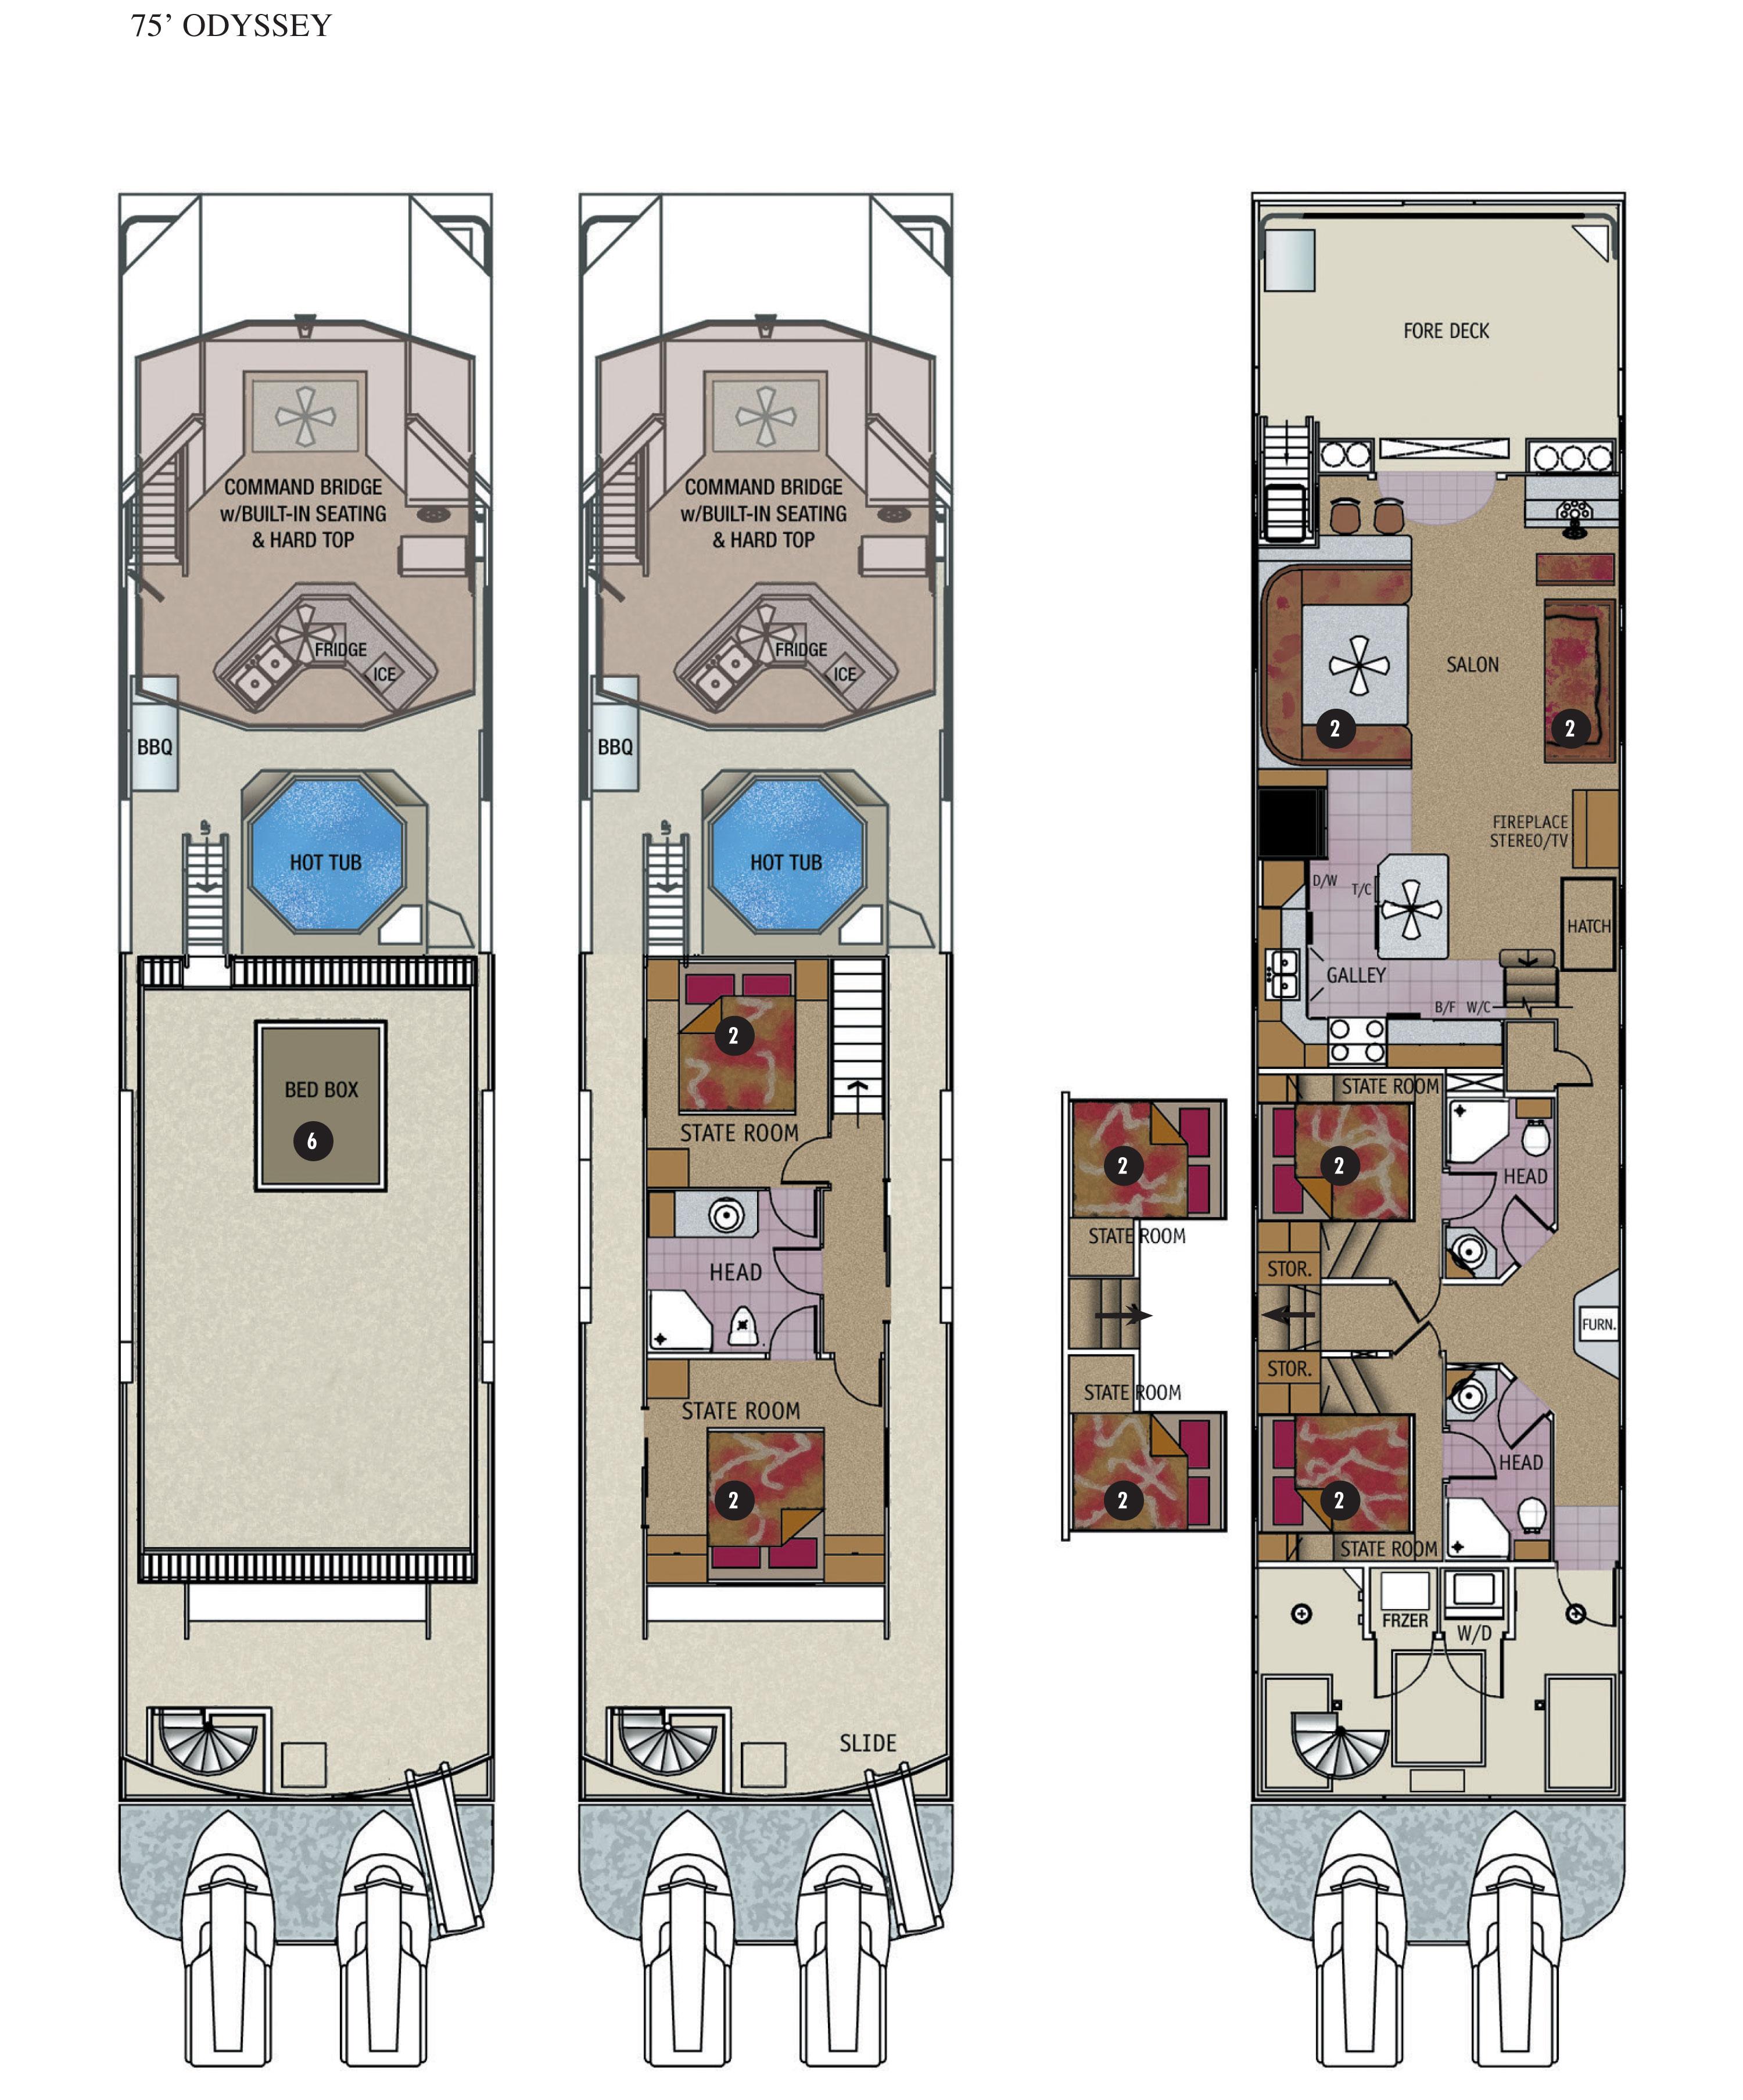 Odyssey Luxury Houseboat Rental Lake Powell Resorts